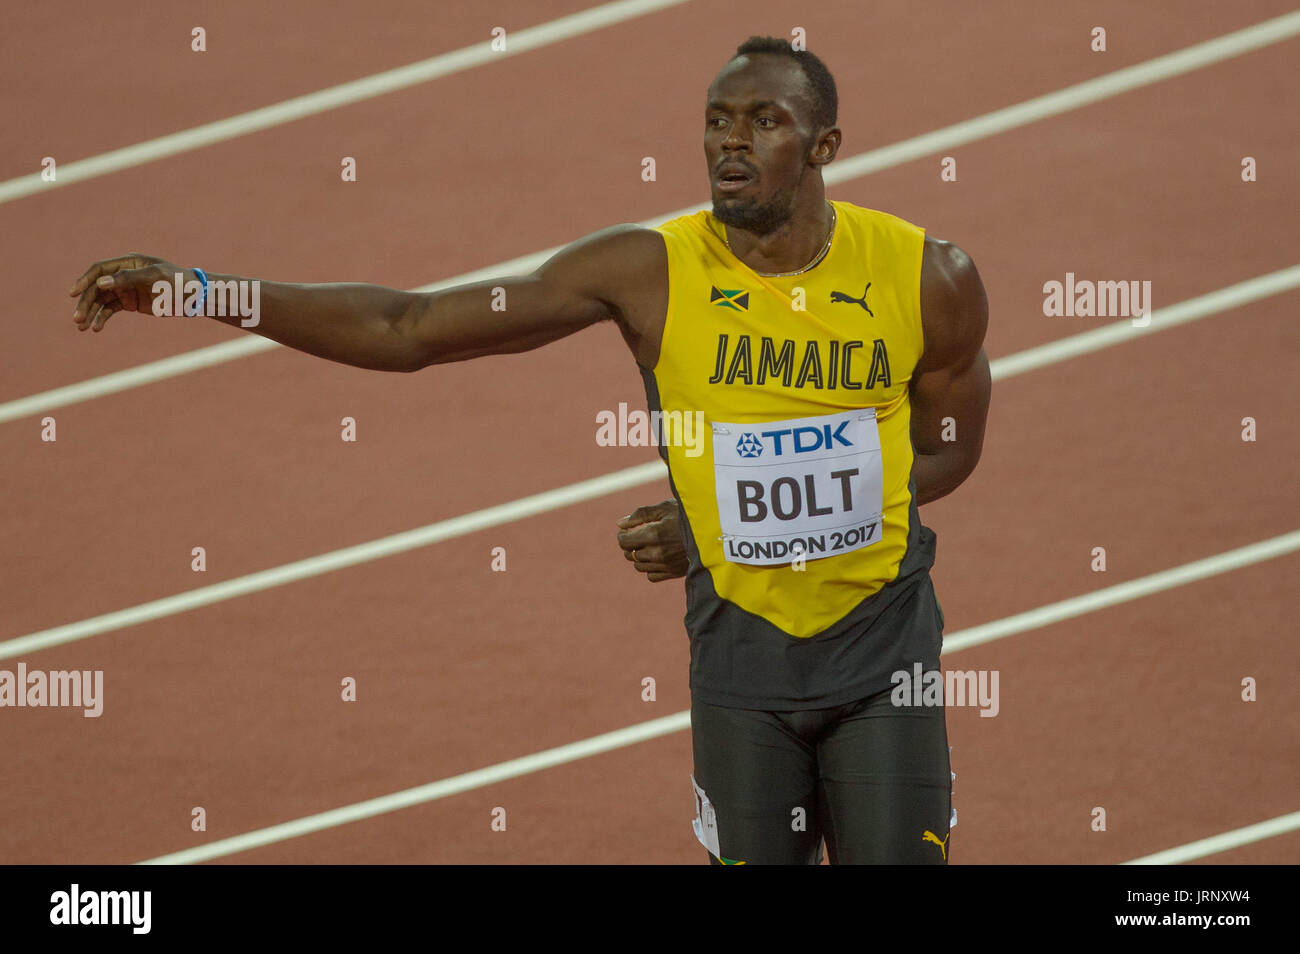 London, UK. 5. August 2017. König Usain Bolt bei der 6. 100m-Serie bei den IAAF World Championships in 2017, Queen Elizabeth Olympic Park, Stratford, London, UK-Credit: Laurent Lairys/Agence Locevaphotos/Alamy Live News Stockfoto